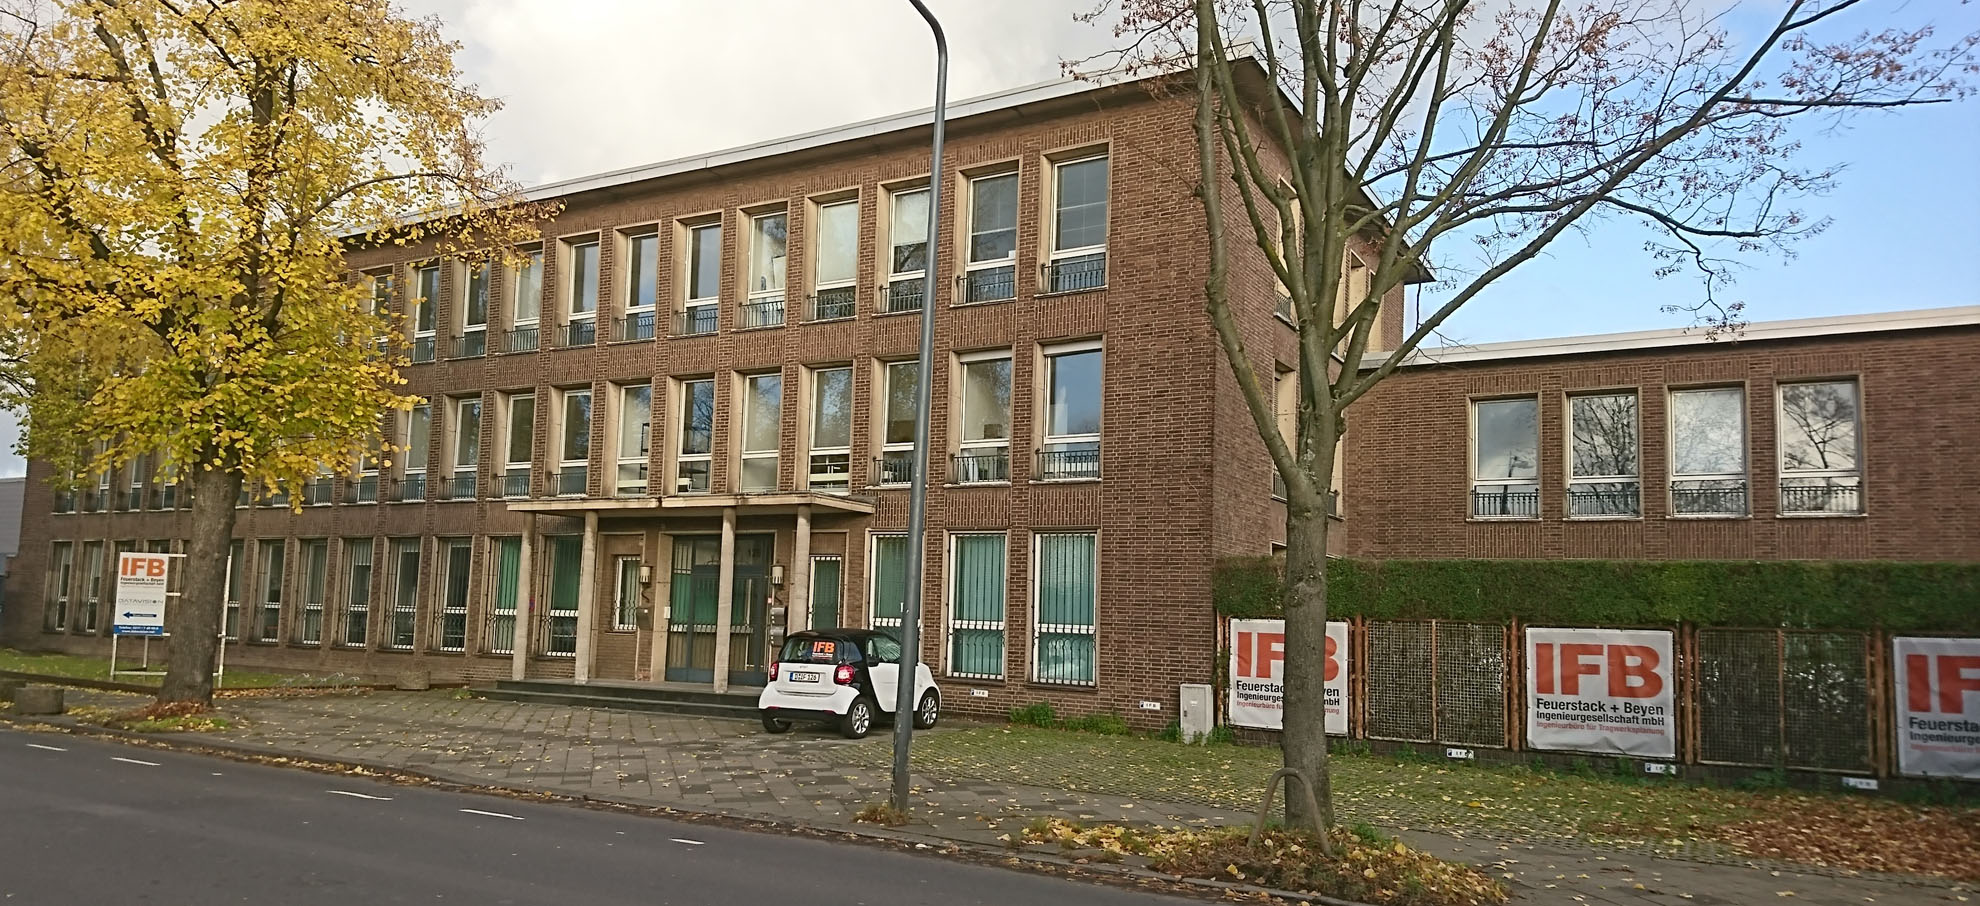 IFB Bürogebäude